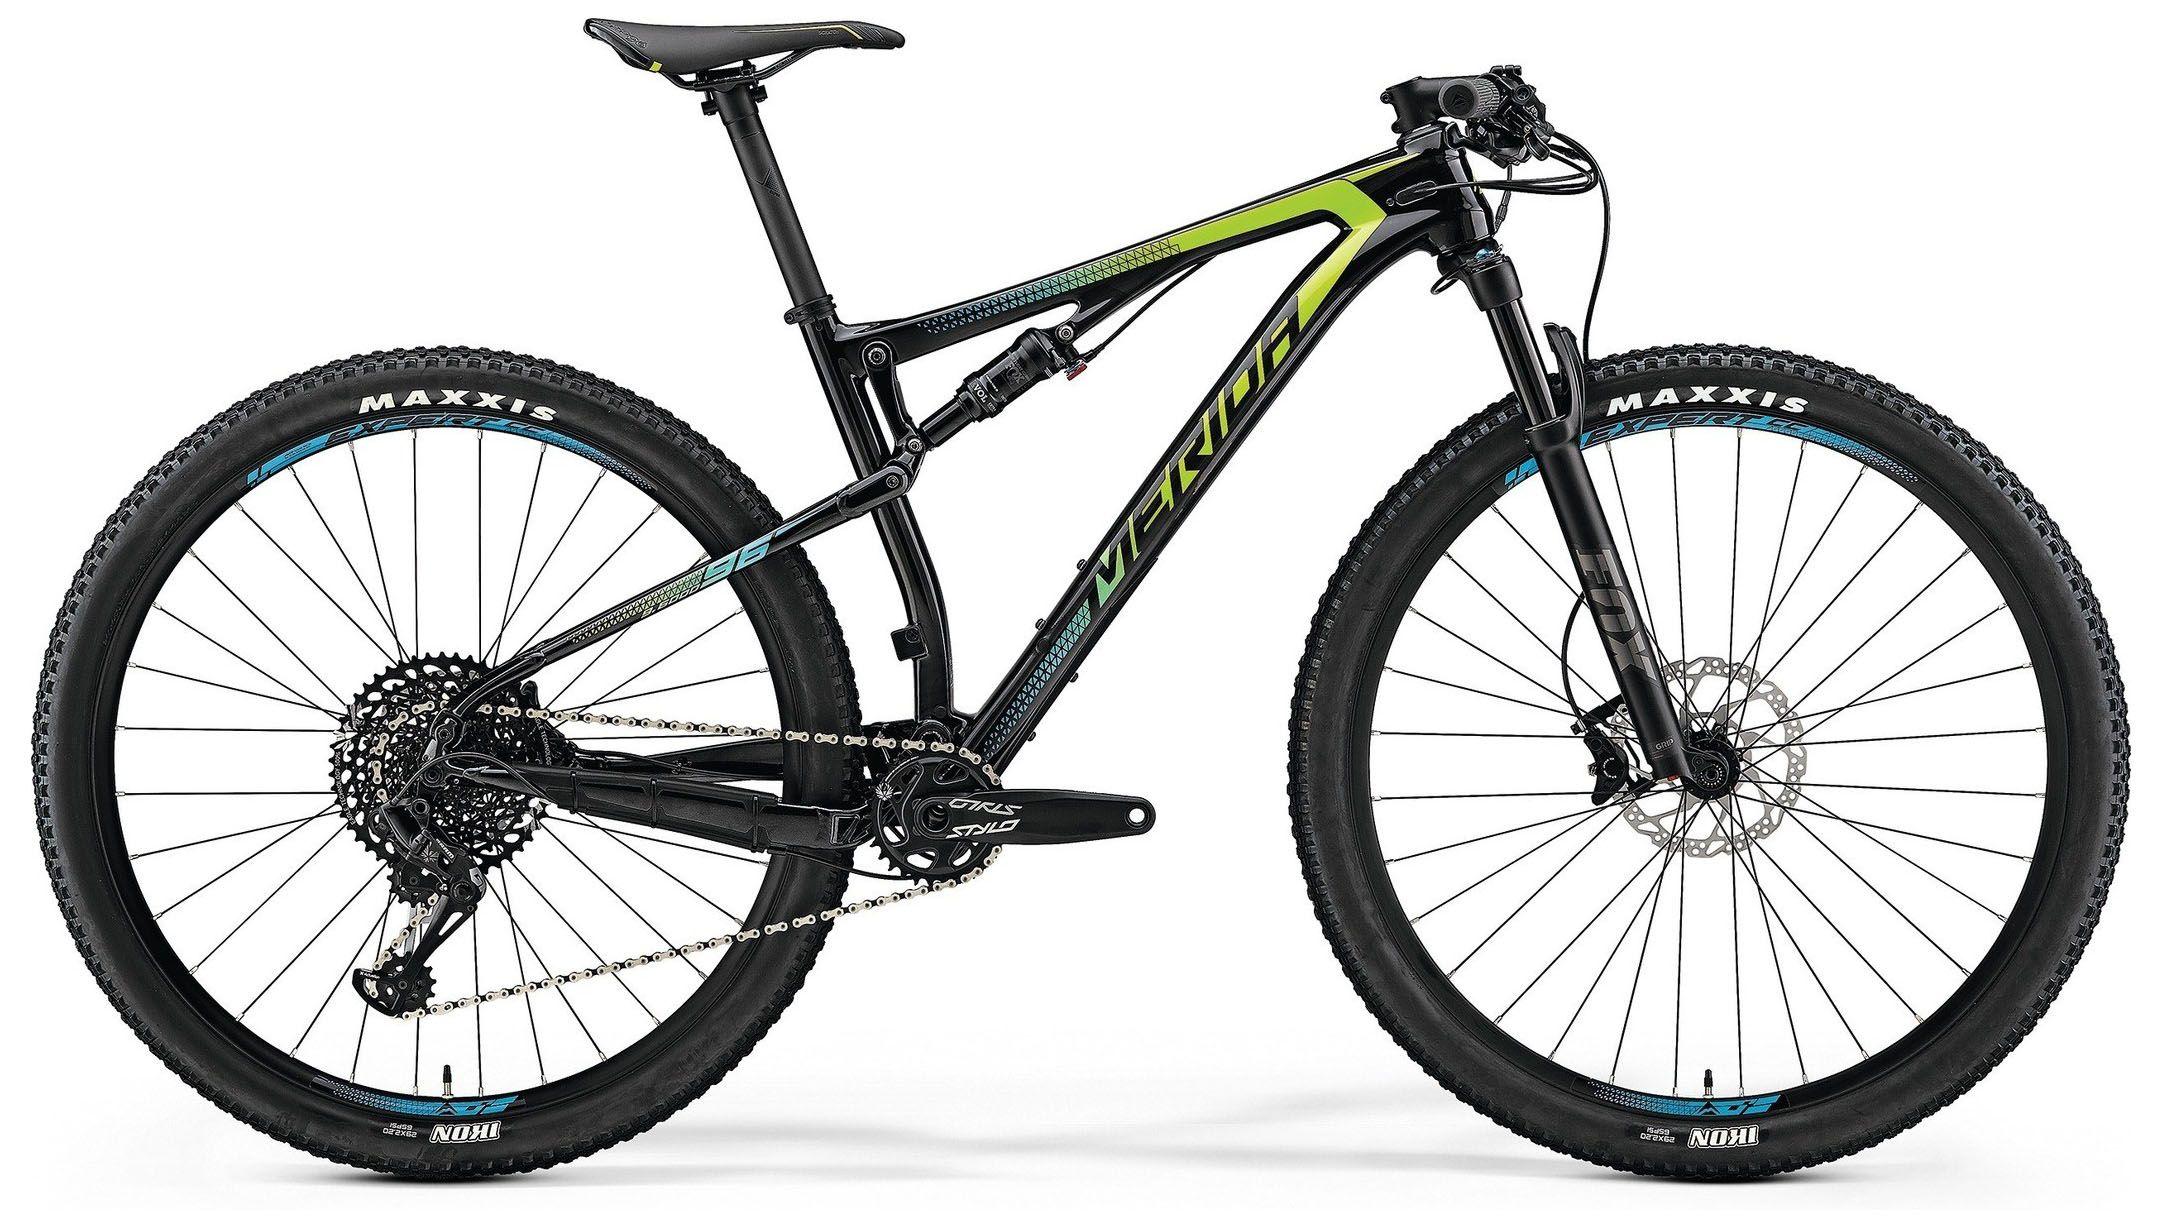 Велосипед Merida Ninety-Six 7.6000 2018,  Двухподвесы  - артикул:287954